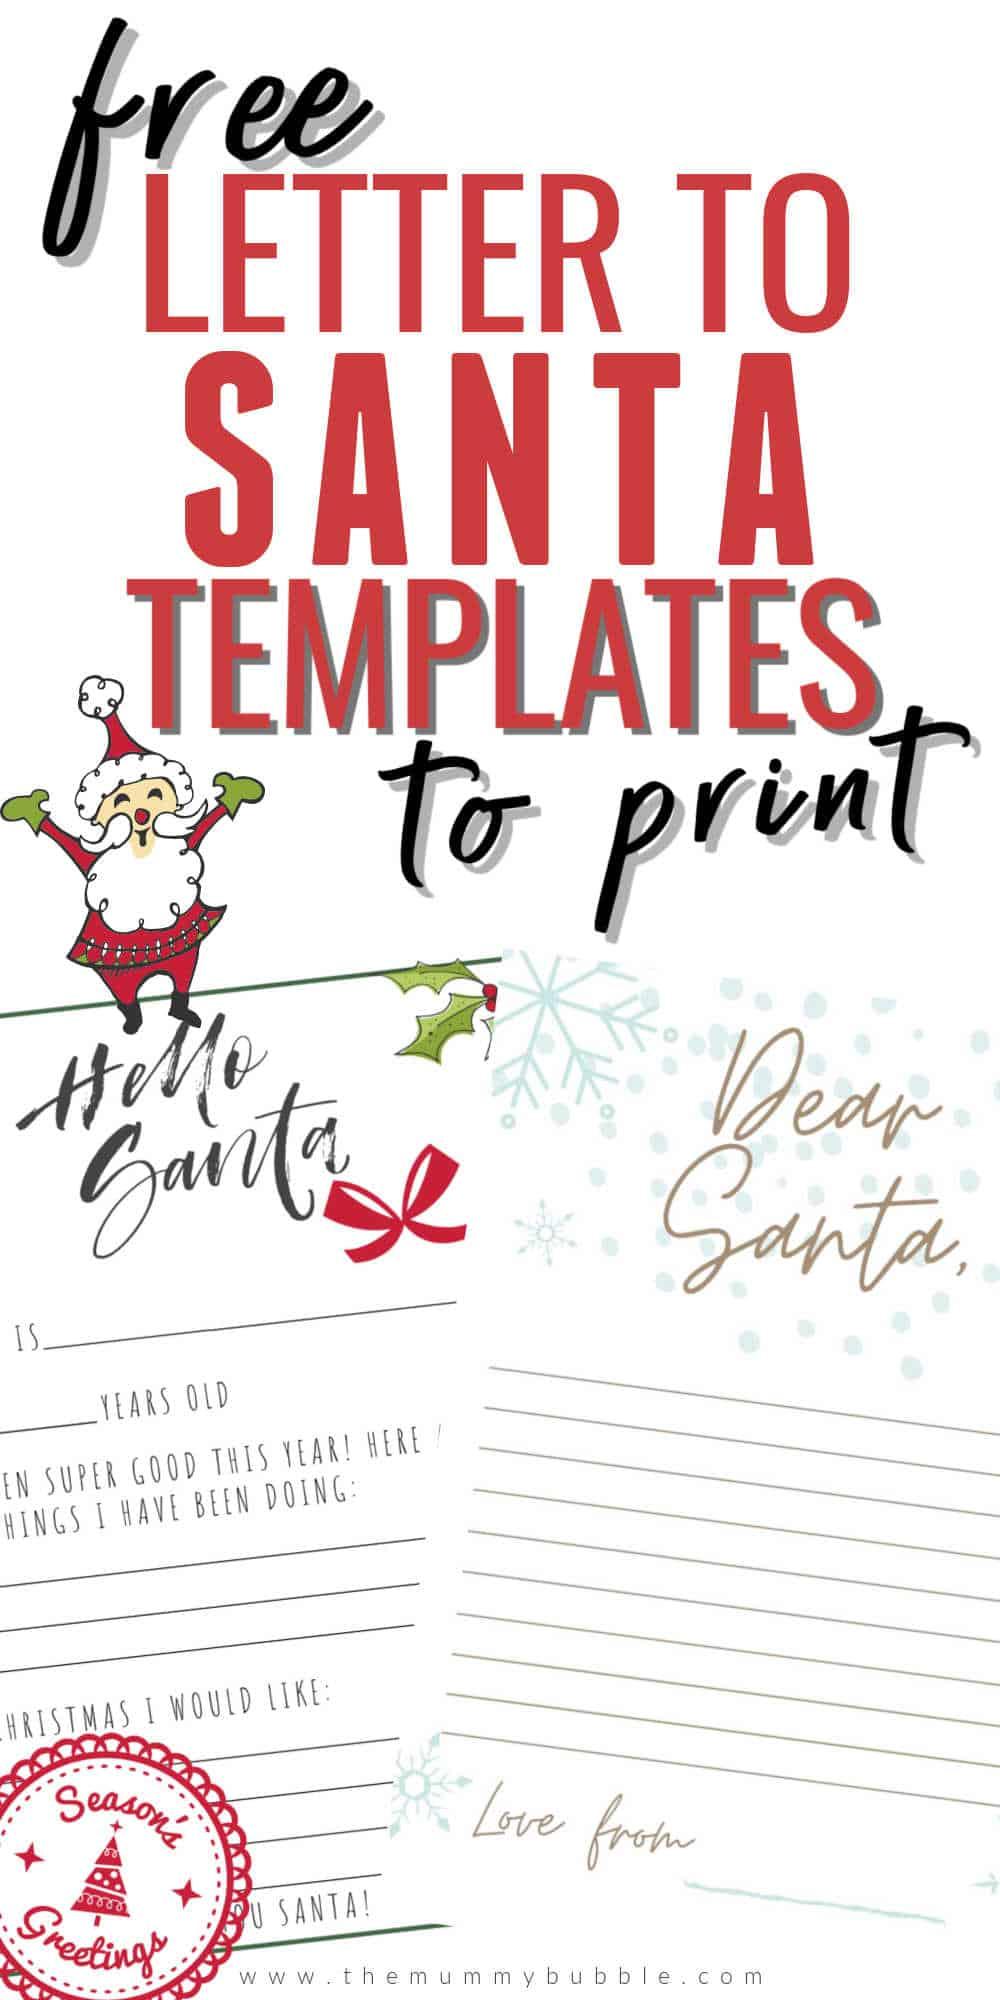 Free Letter To Santa Pdf Templates Plus Santa S Address The Mummy Bubble